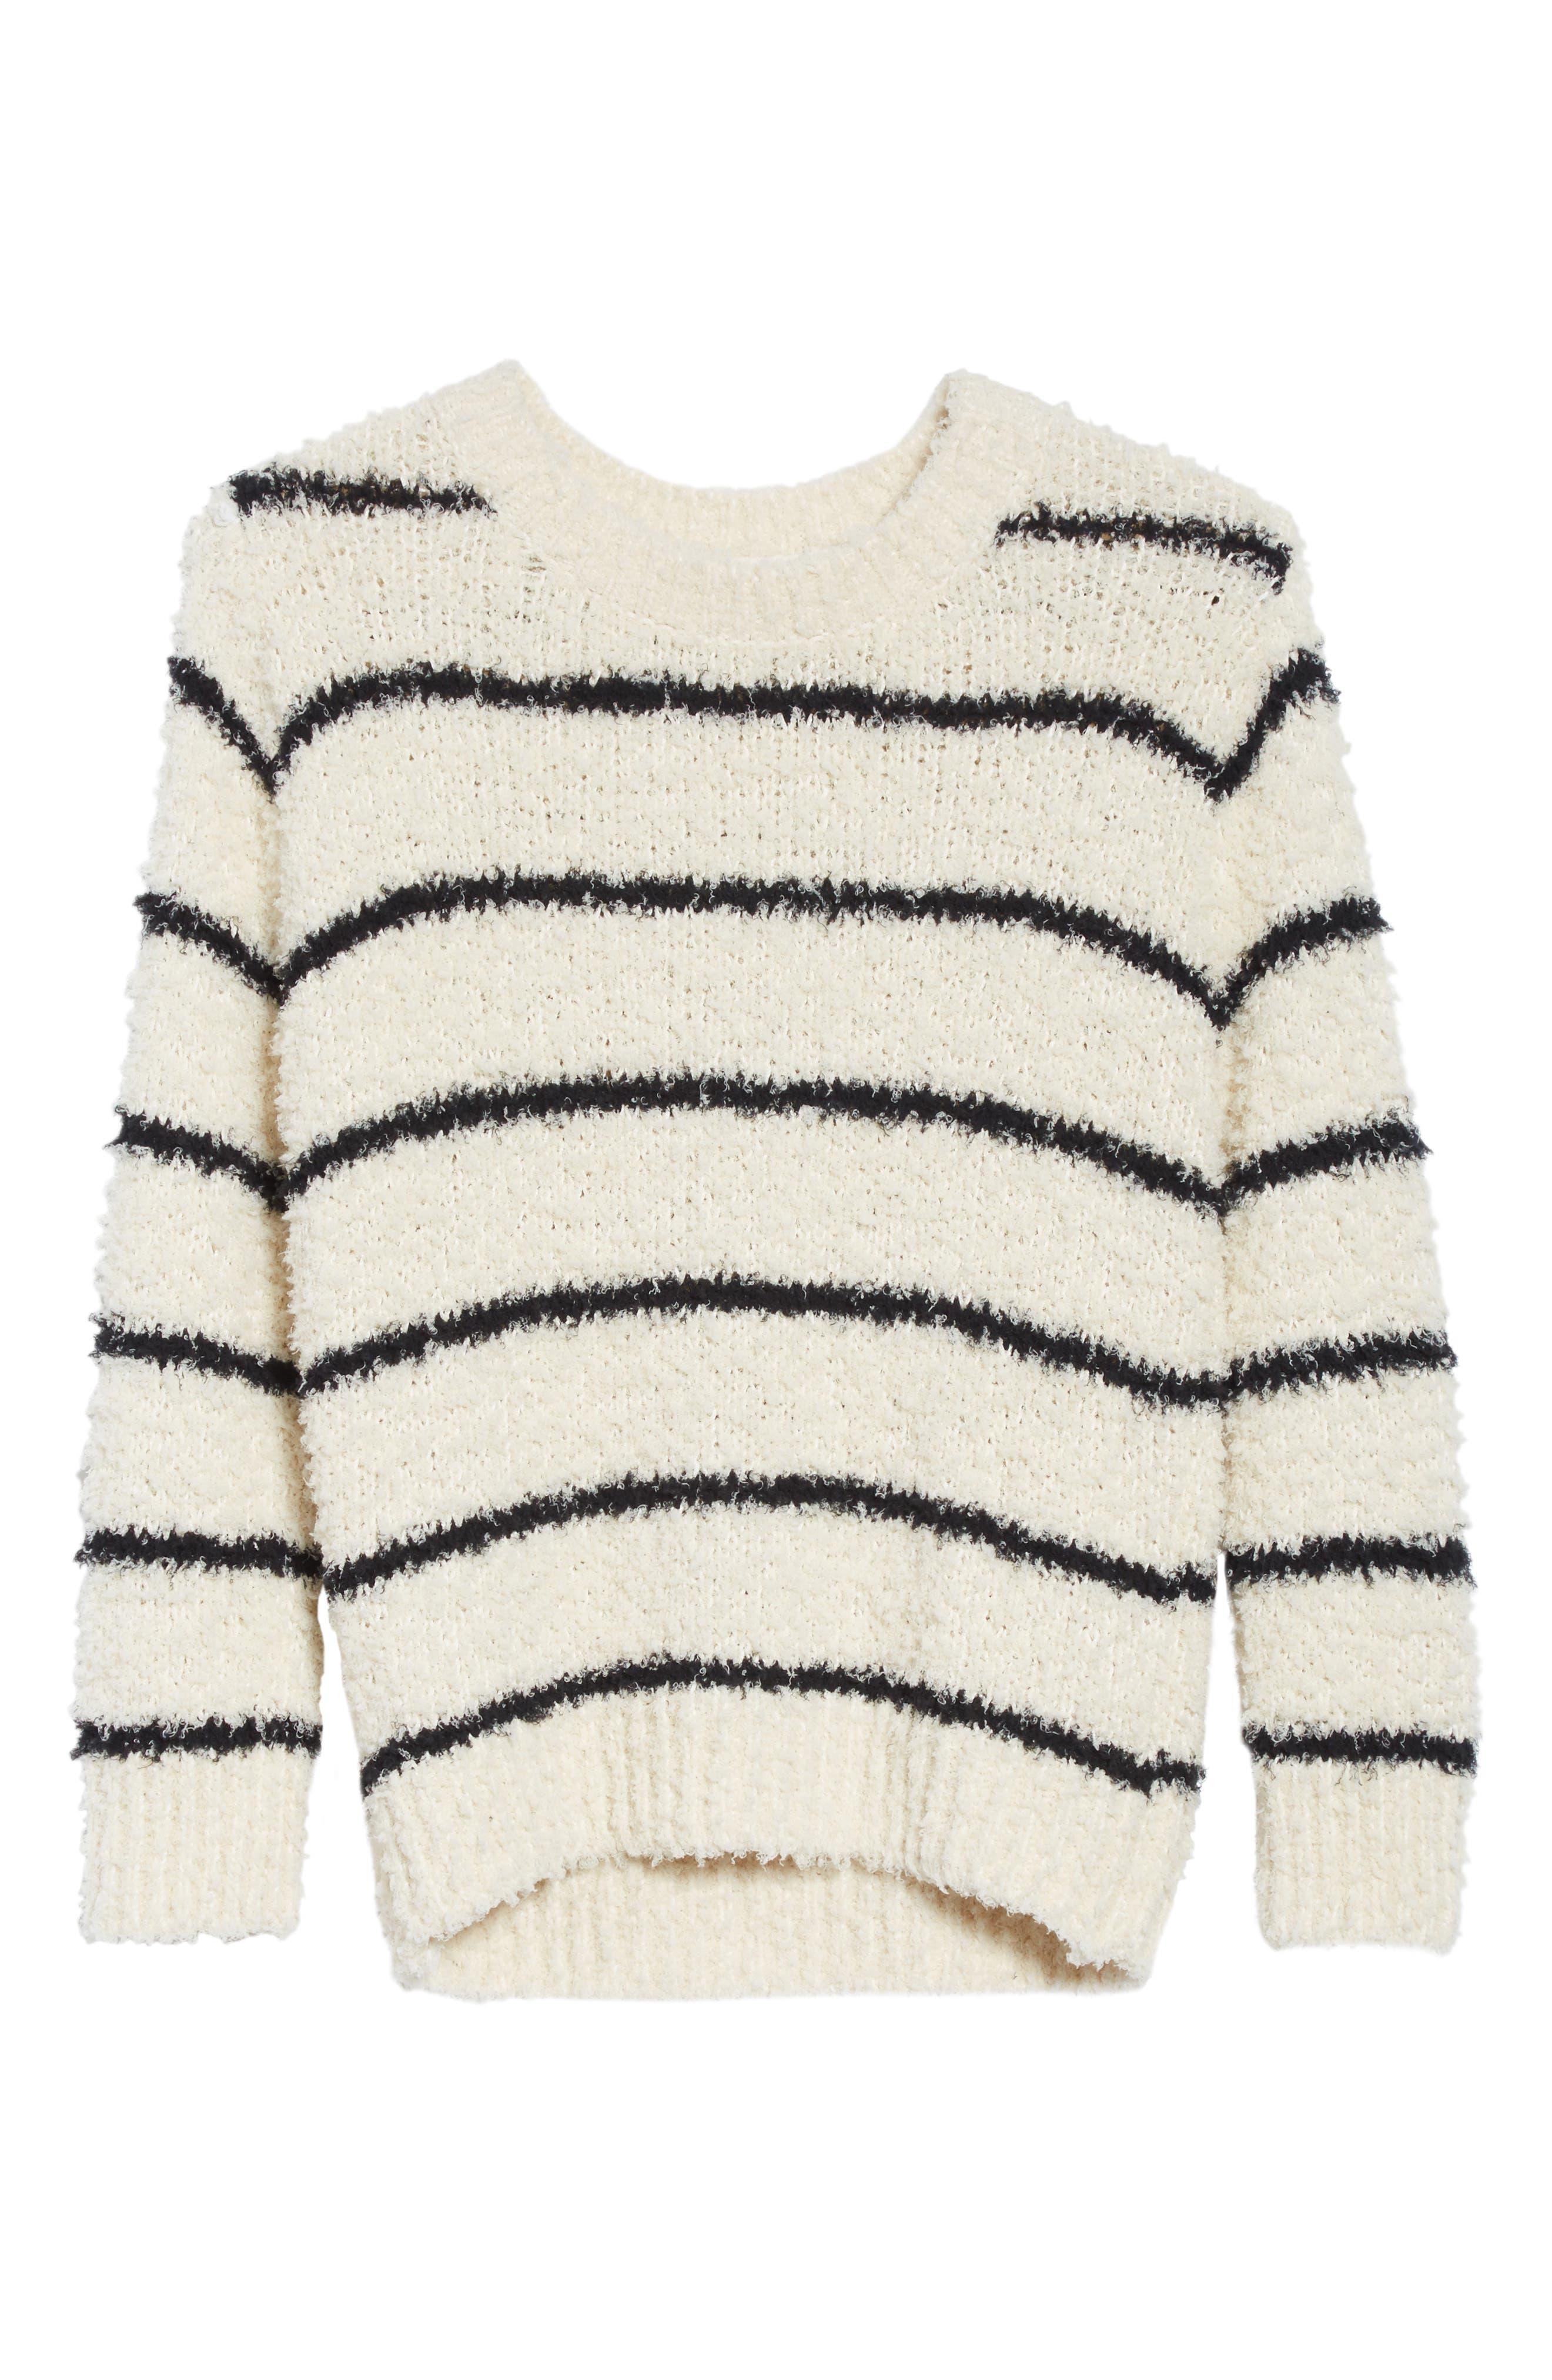 Fuzzy Stripe Sweater,                             Alternate thumbnail 6, color,                             Cream/ Black